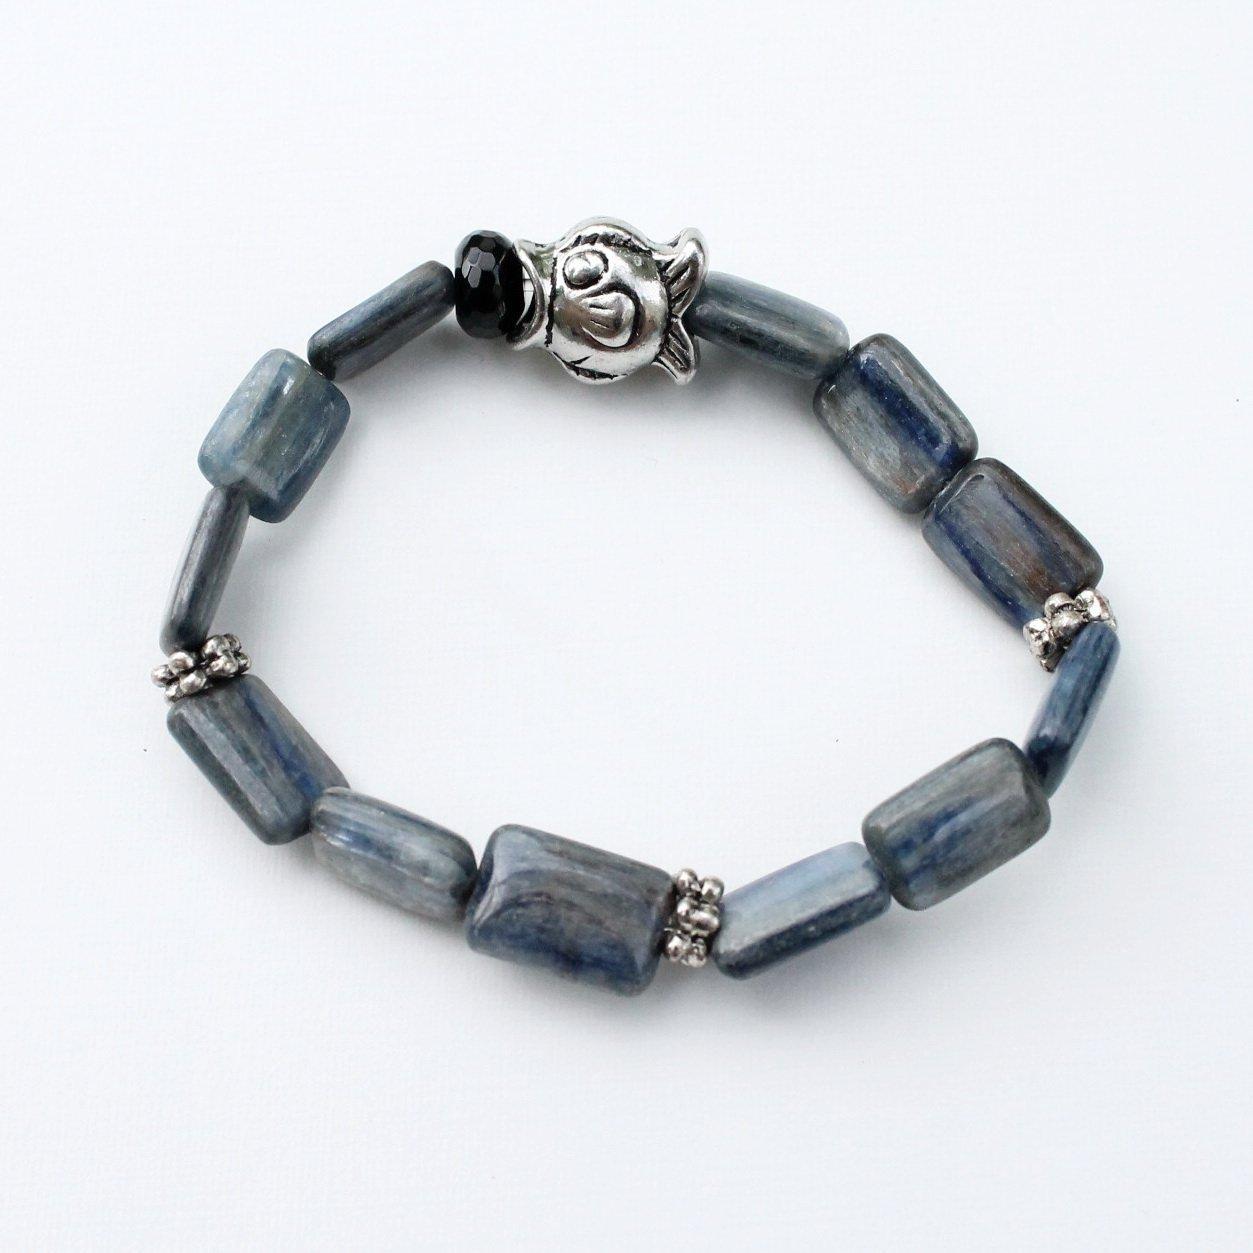 Blue Kyanite and Black Onyx Ranking 25% OFF TOP2 Crystal Silve Bracelet Inspired Yoga